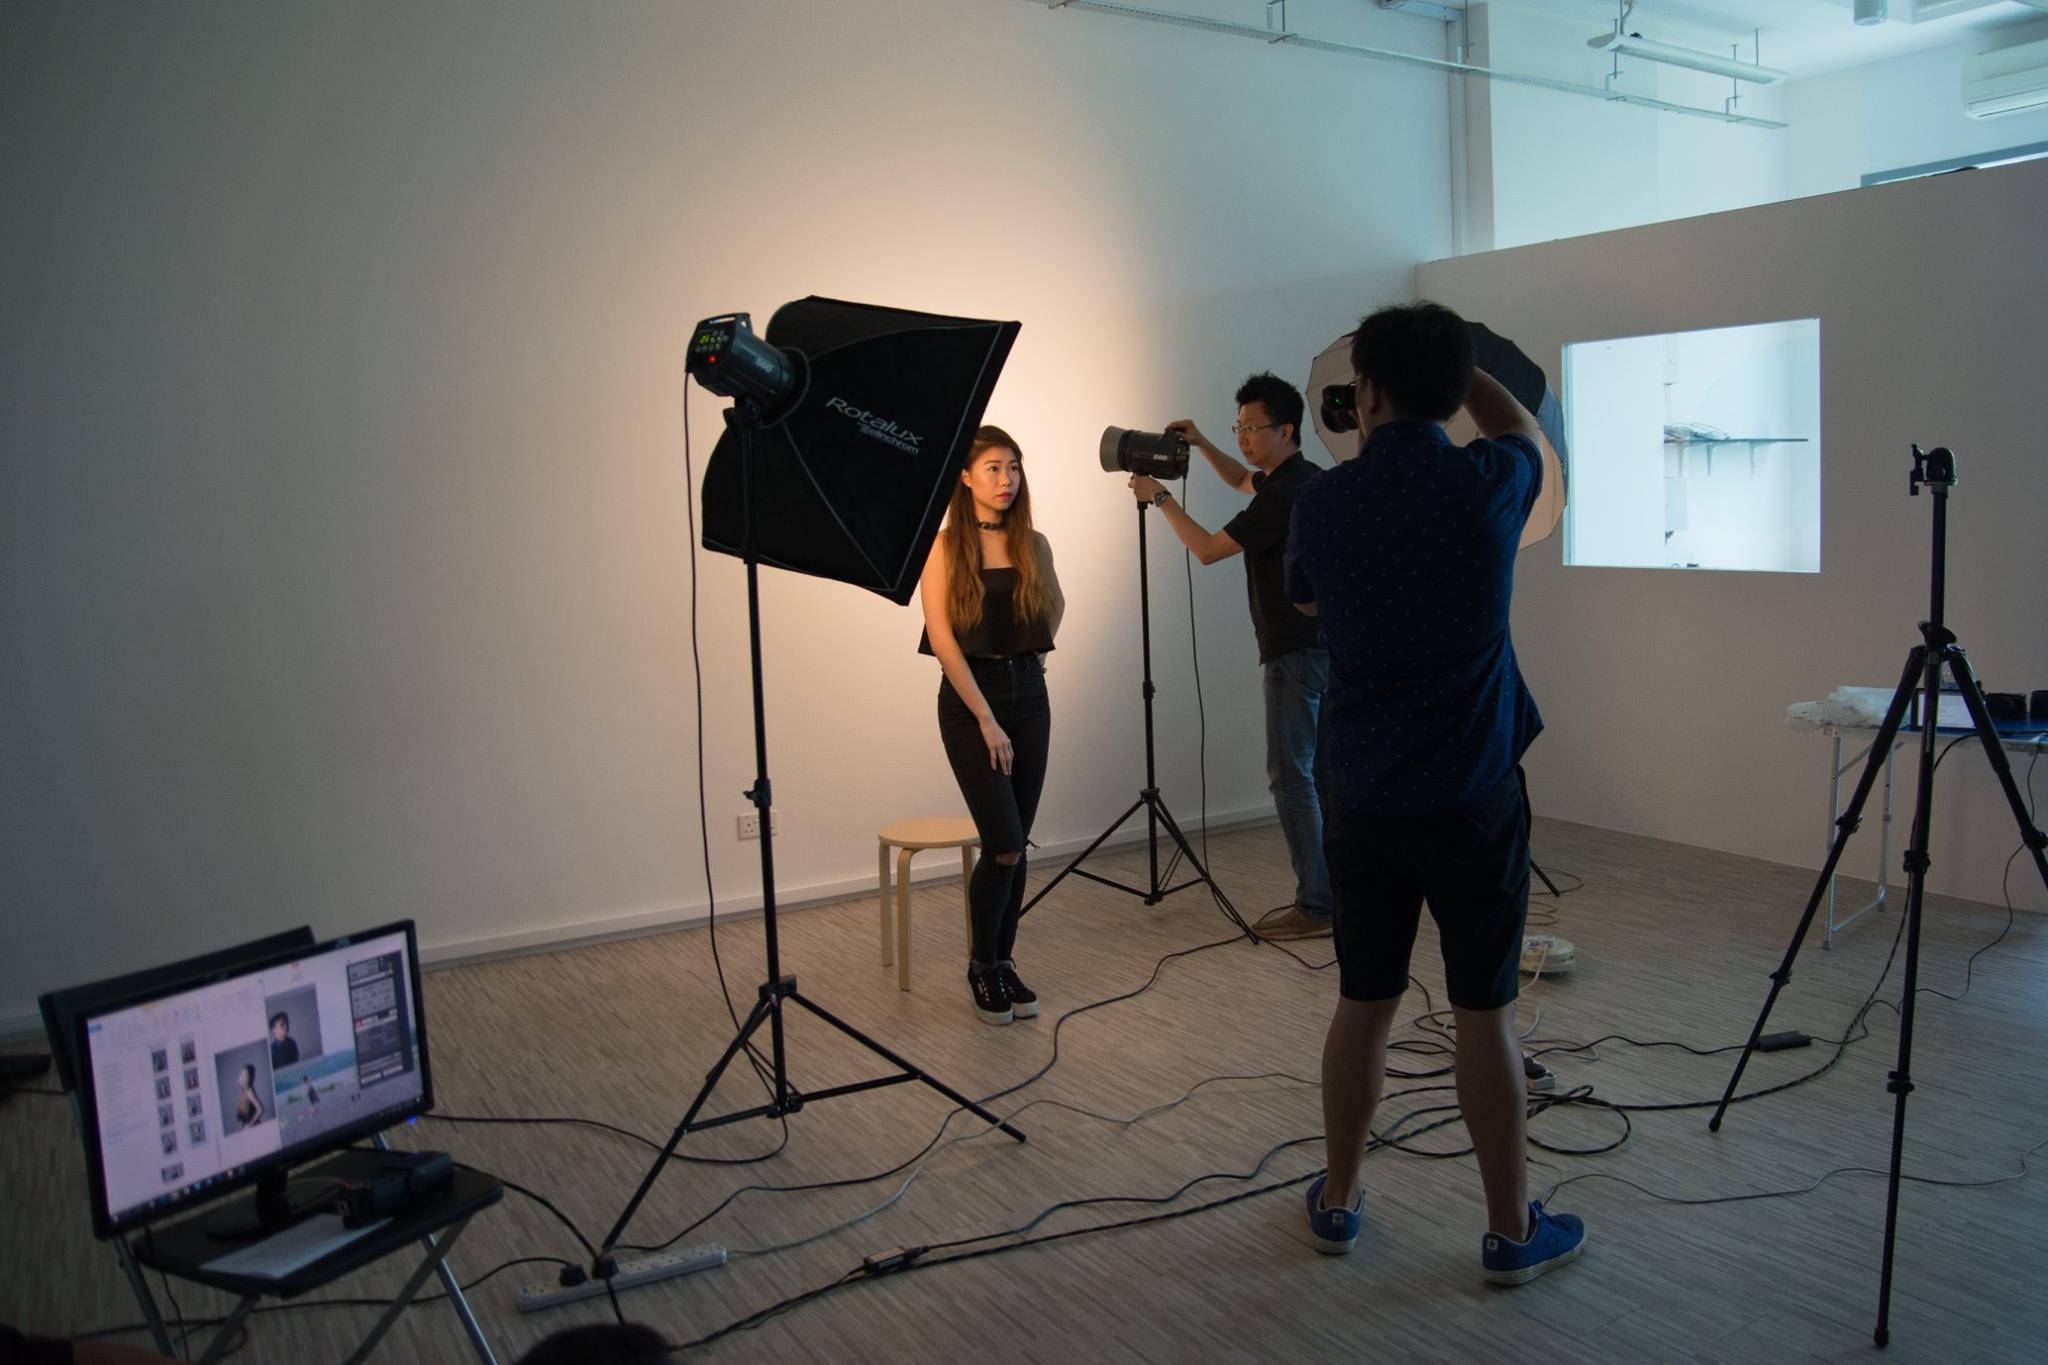 Studio 101: The Basics of Studio Photography